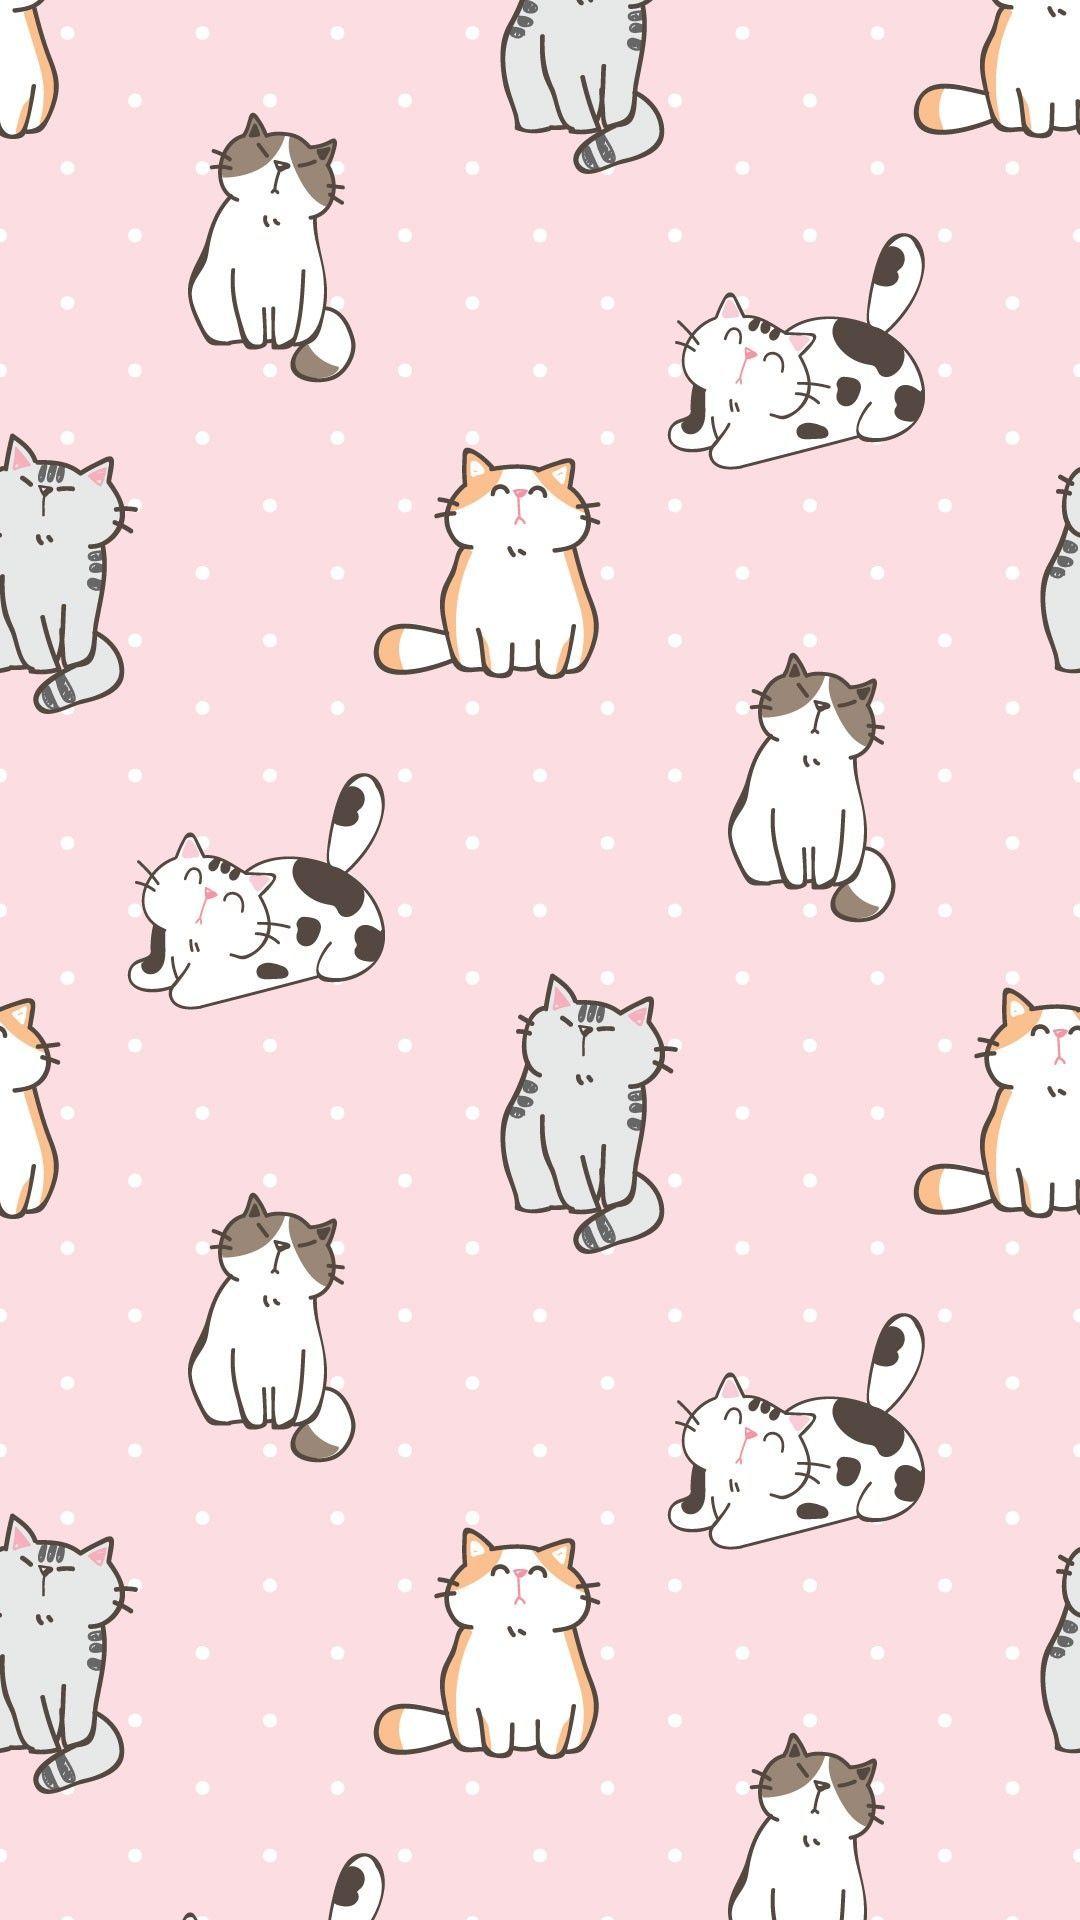 20 Kitty cat wallpaper ideas in 20   cat wallpaper, wallpaper ...